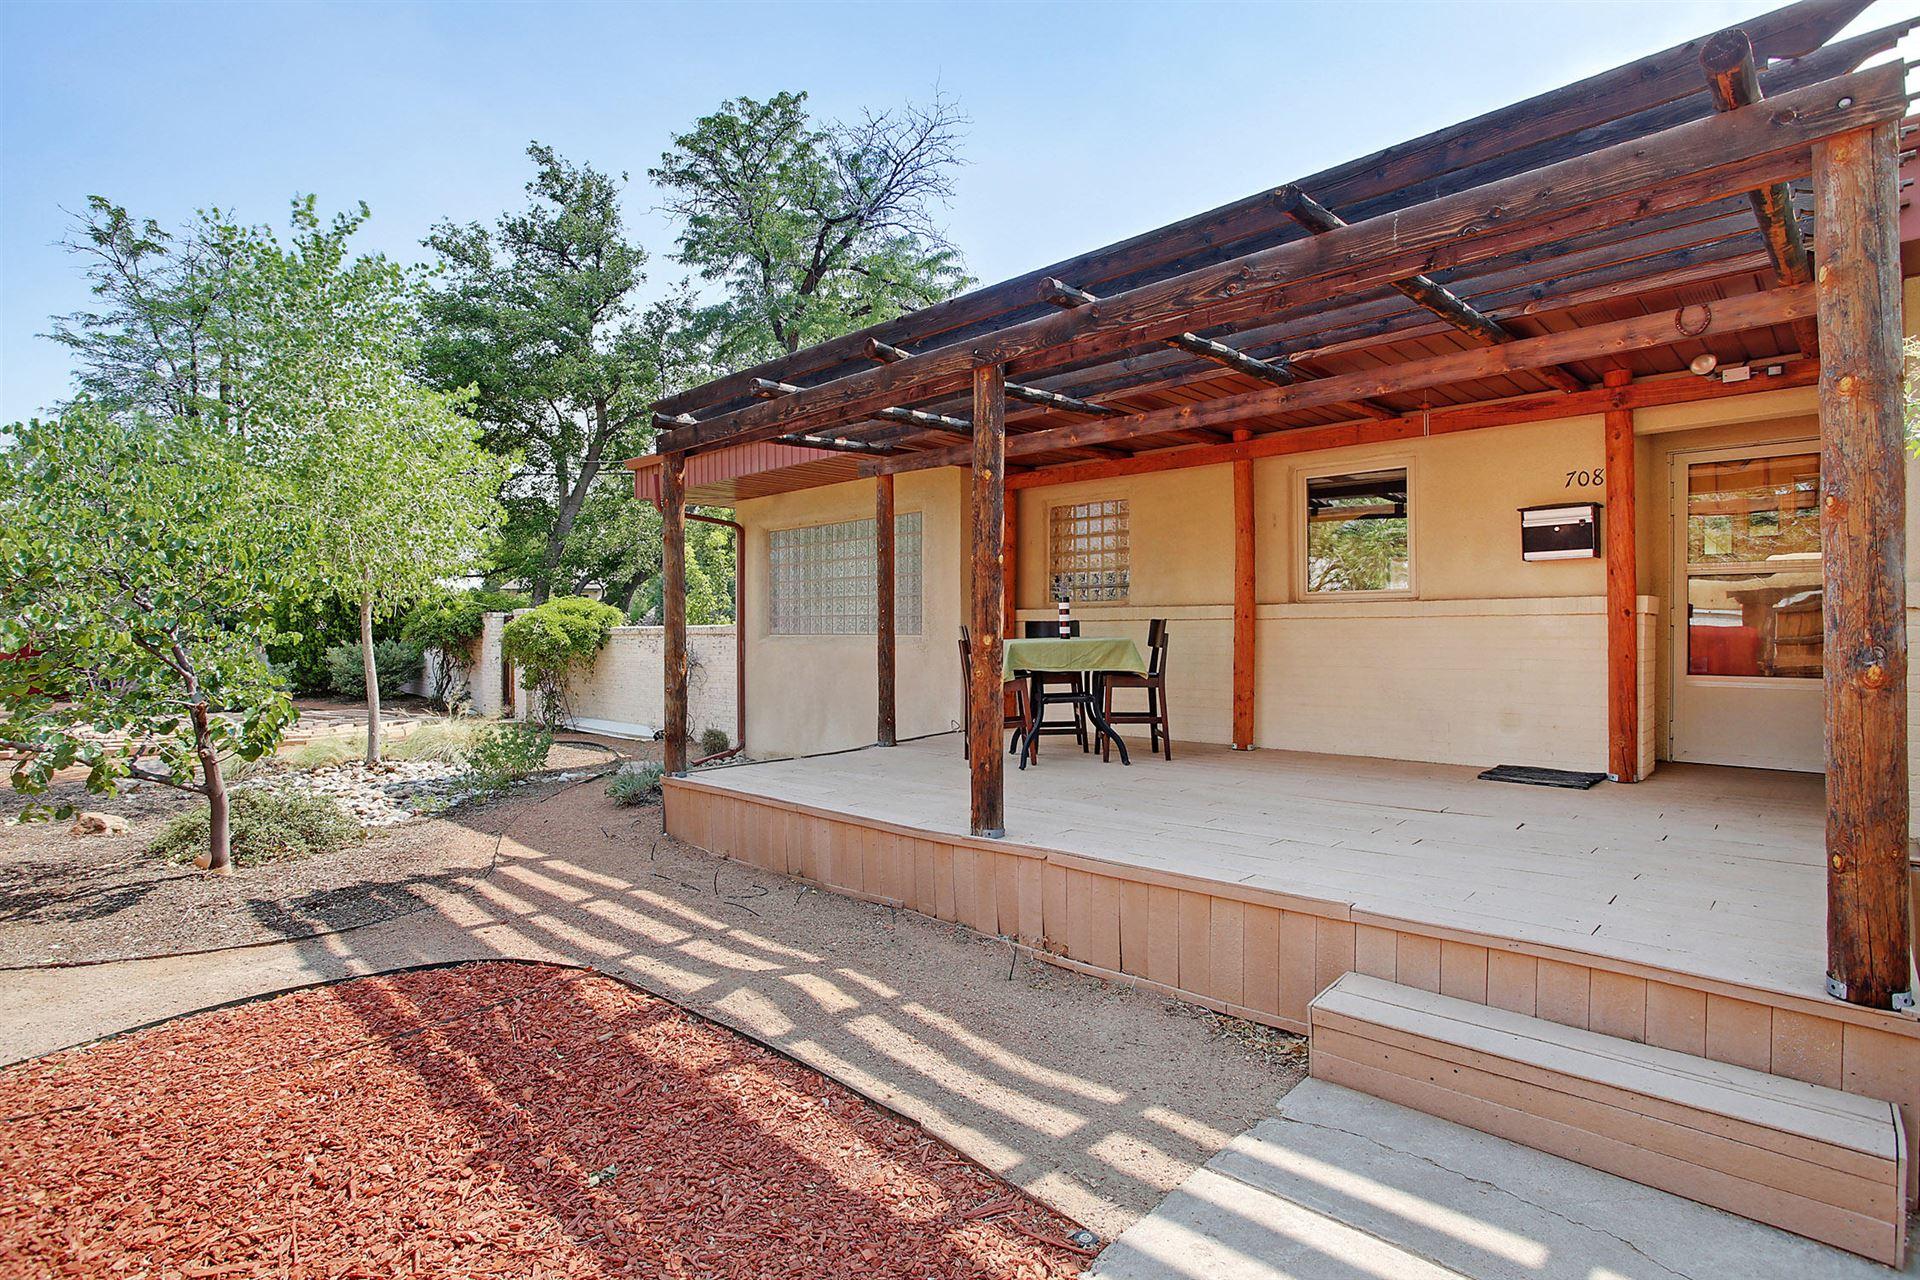 Photo of 708 MORNINGSIDE Drive SE, Albuquerque, NM 87108 (MLS # 970941)